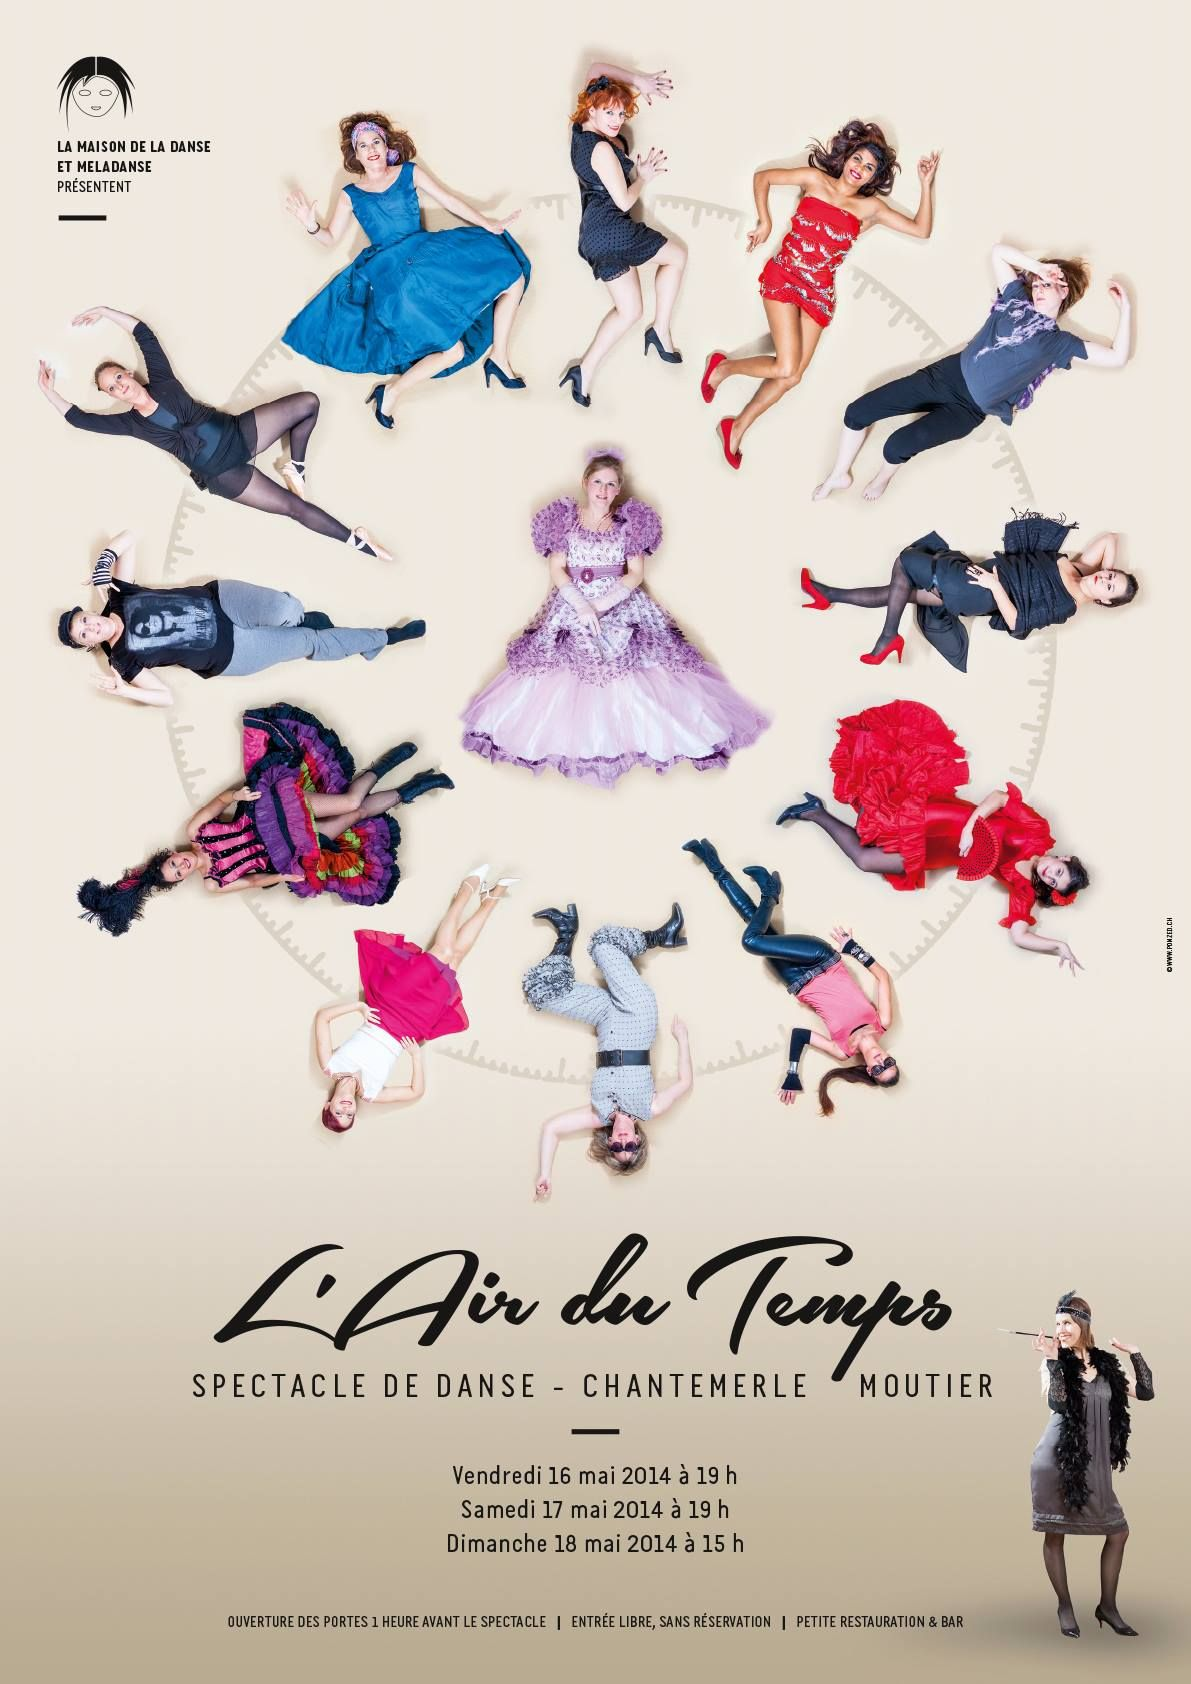 Spectacle de danse - Meladanse 2014